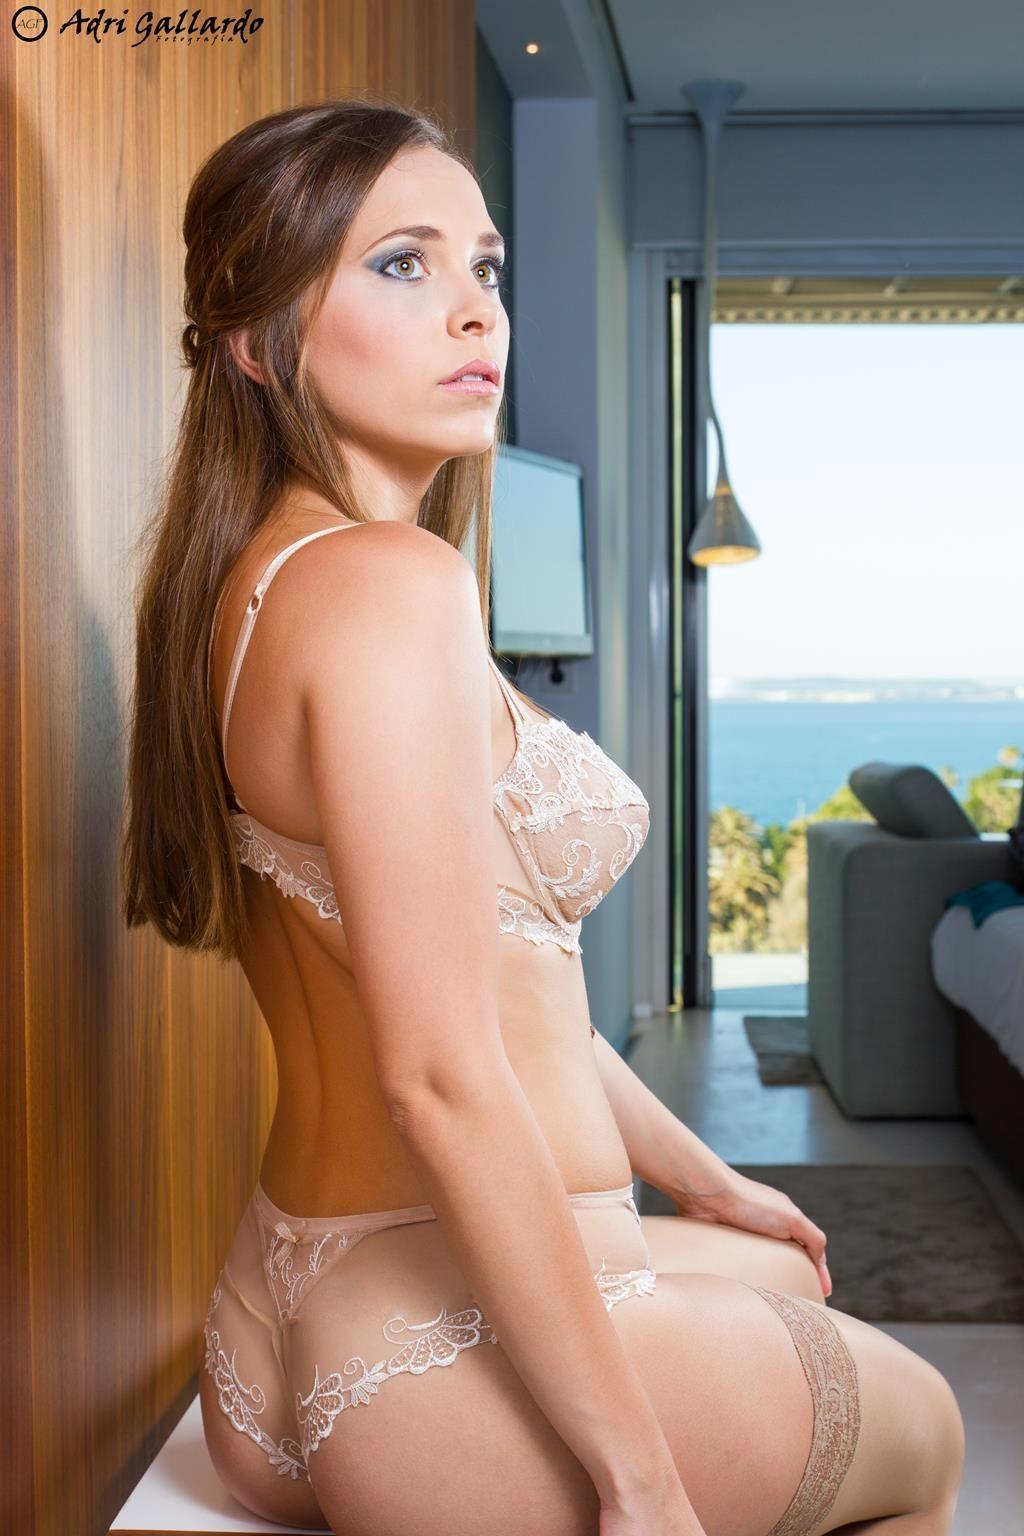 Fotografia : Adri Gallardo ................ Modelos : Julia Rodriguez....... Maquillaje : Alba Ruiz Make Up .........Lenceria : Lise Charmel ........... Lugar :Parador Hotel Atlantico .......... www.azaharlenceri...